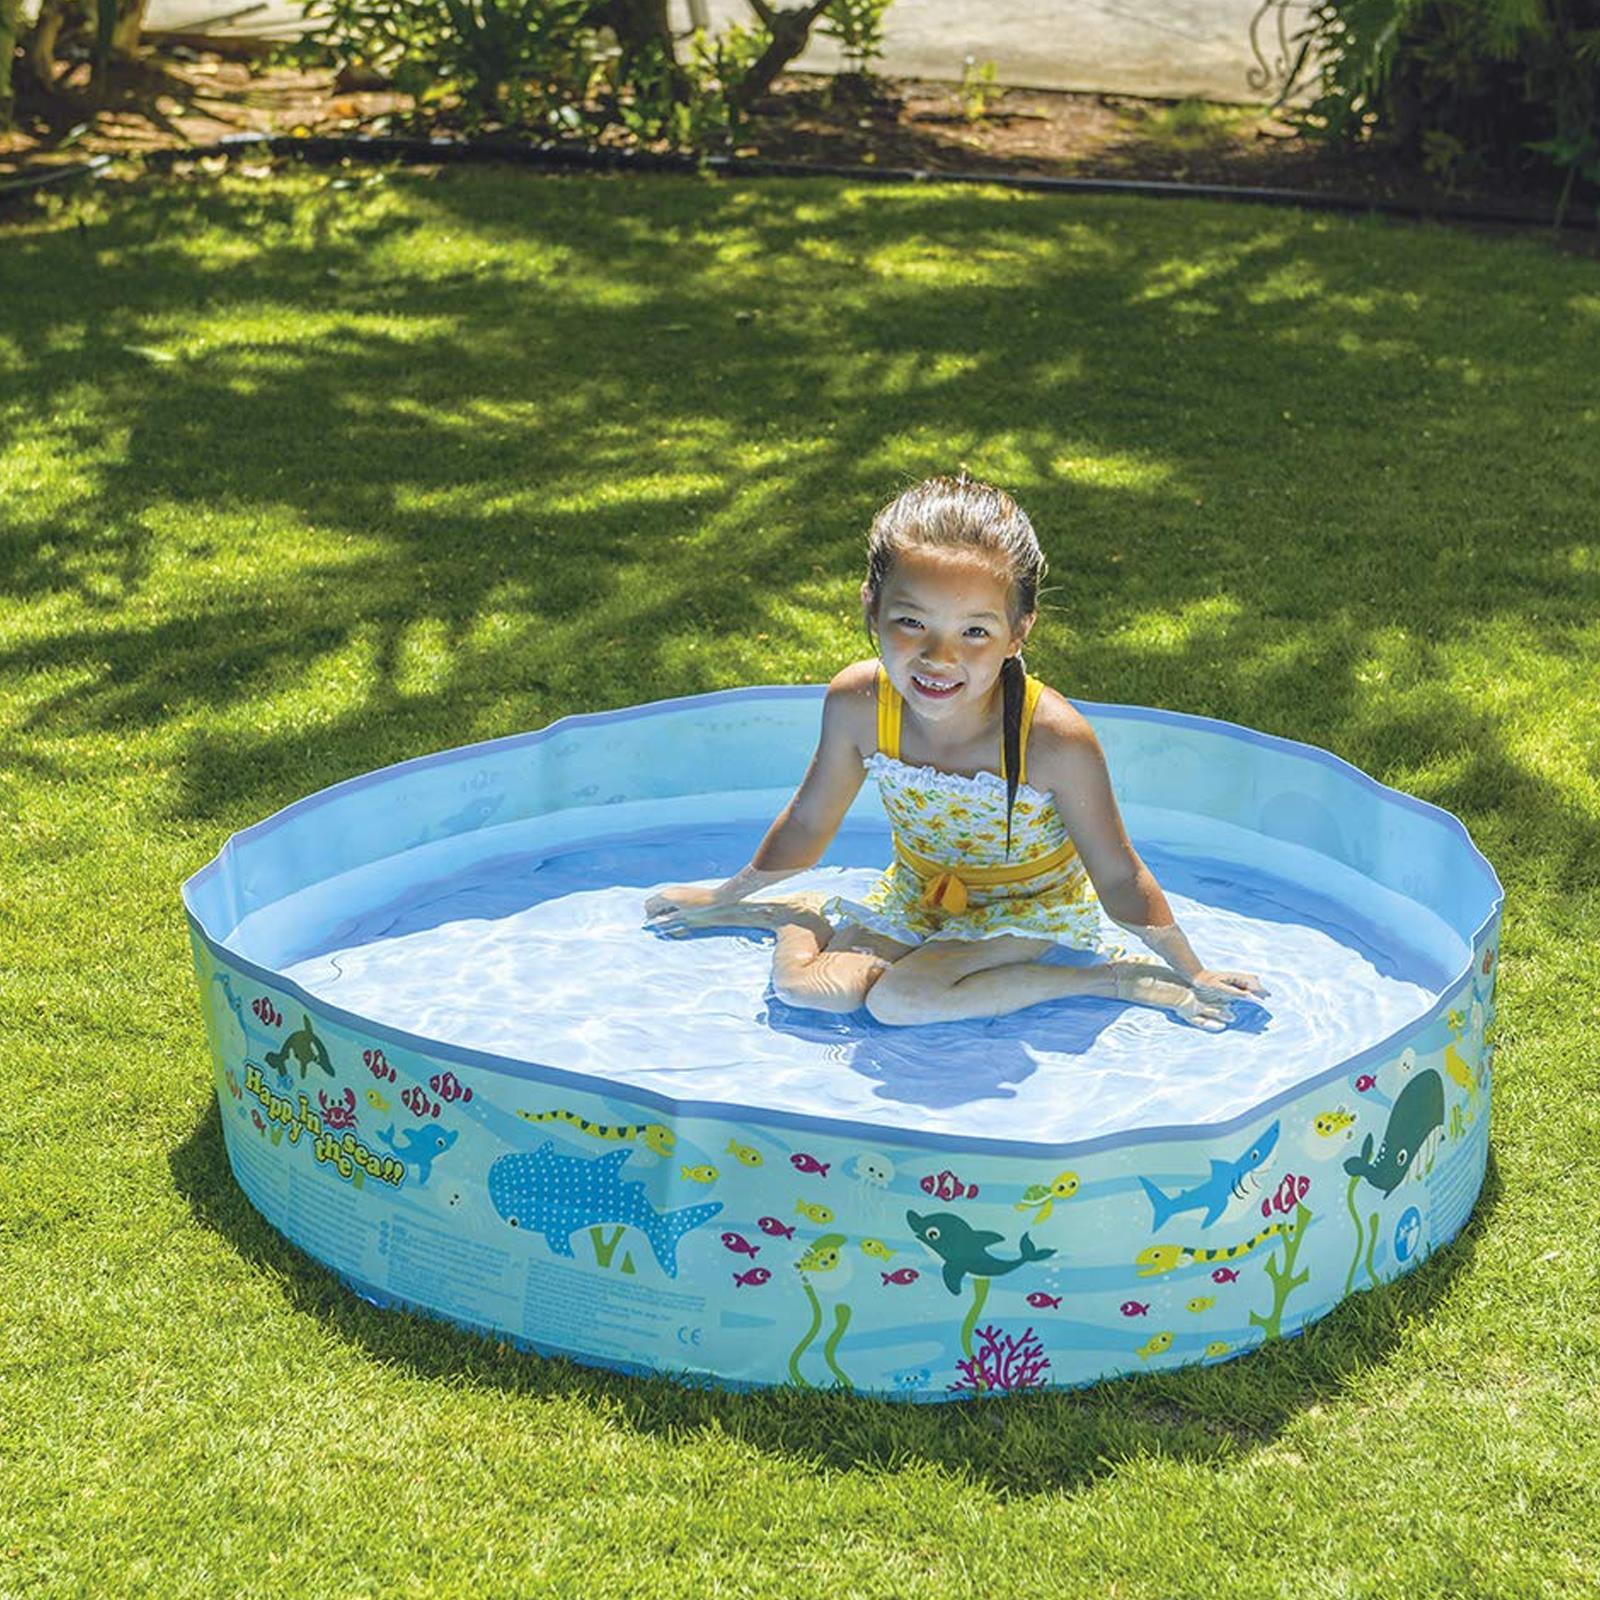 Centro-De-Juegos-De-Natacion-Ninos-Ridgid-Pared-piscina-infantil-Mar-Vida-al-Aire-Libre-diversion miniatura 4